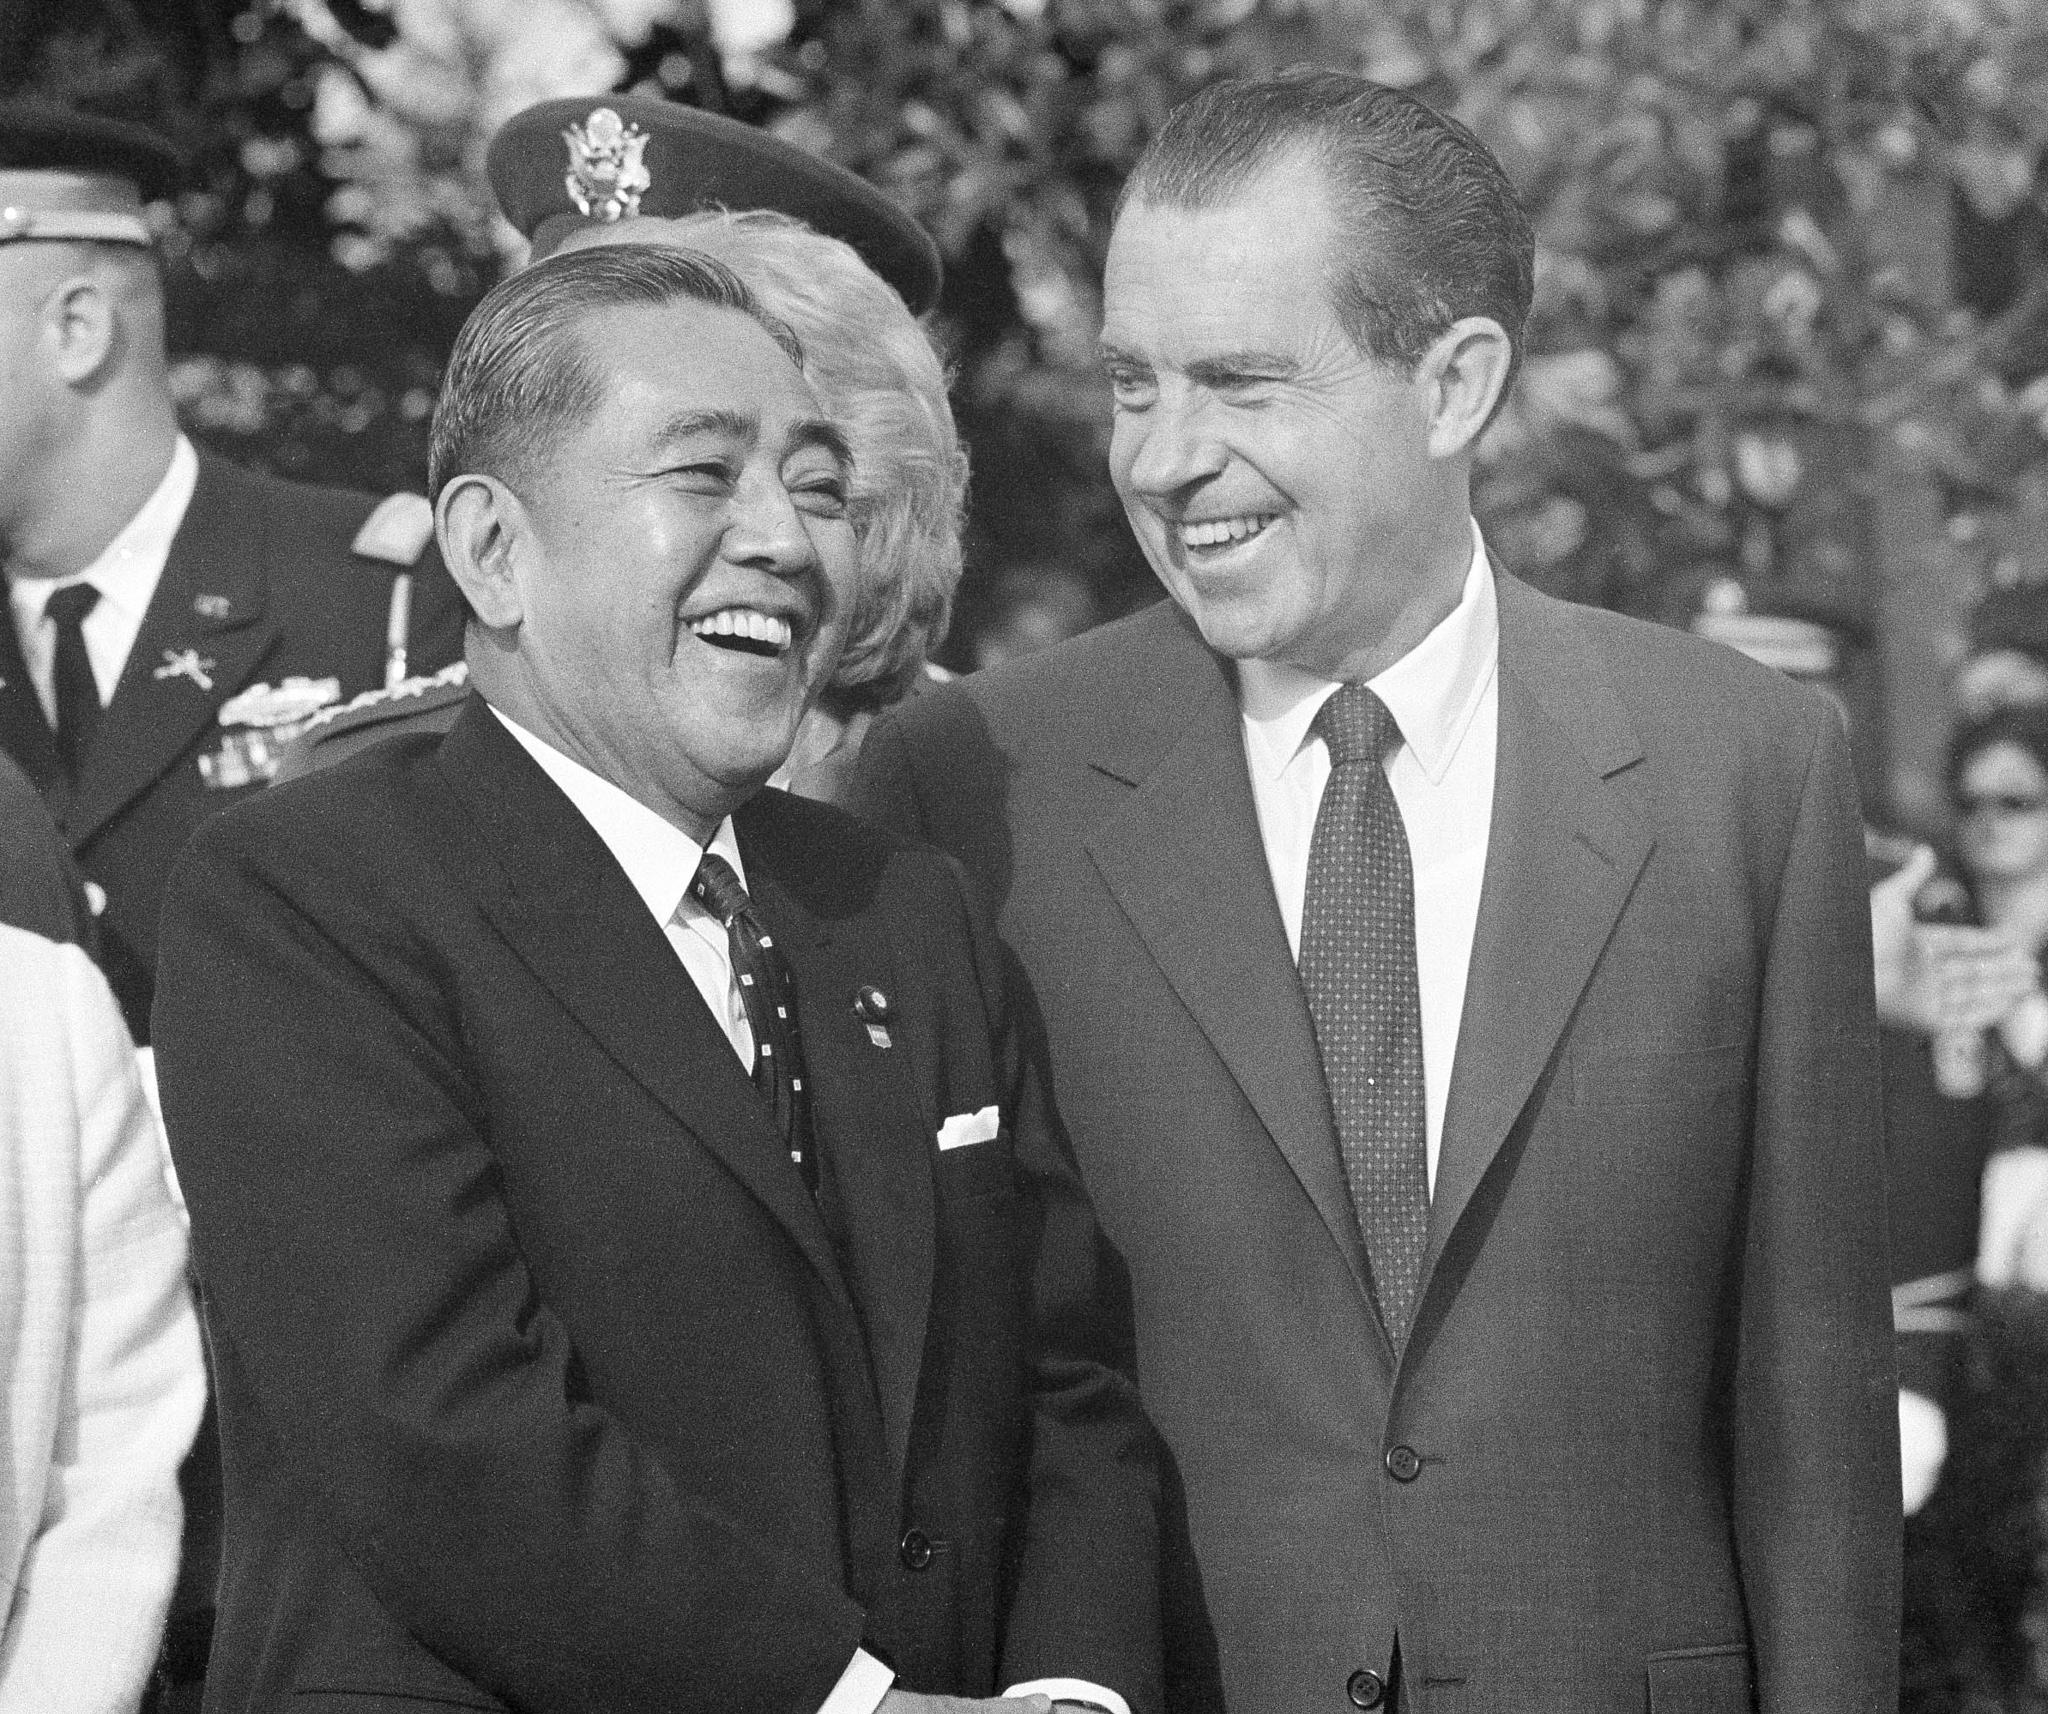 Japanese Prime Minister Eisaku Sato and U.S. President Richard Nixon standing and smiling (© AP Images)